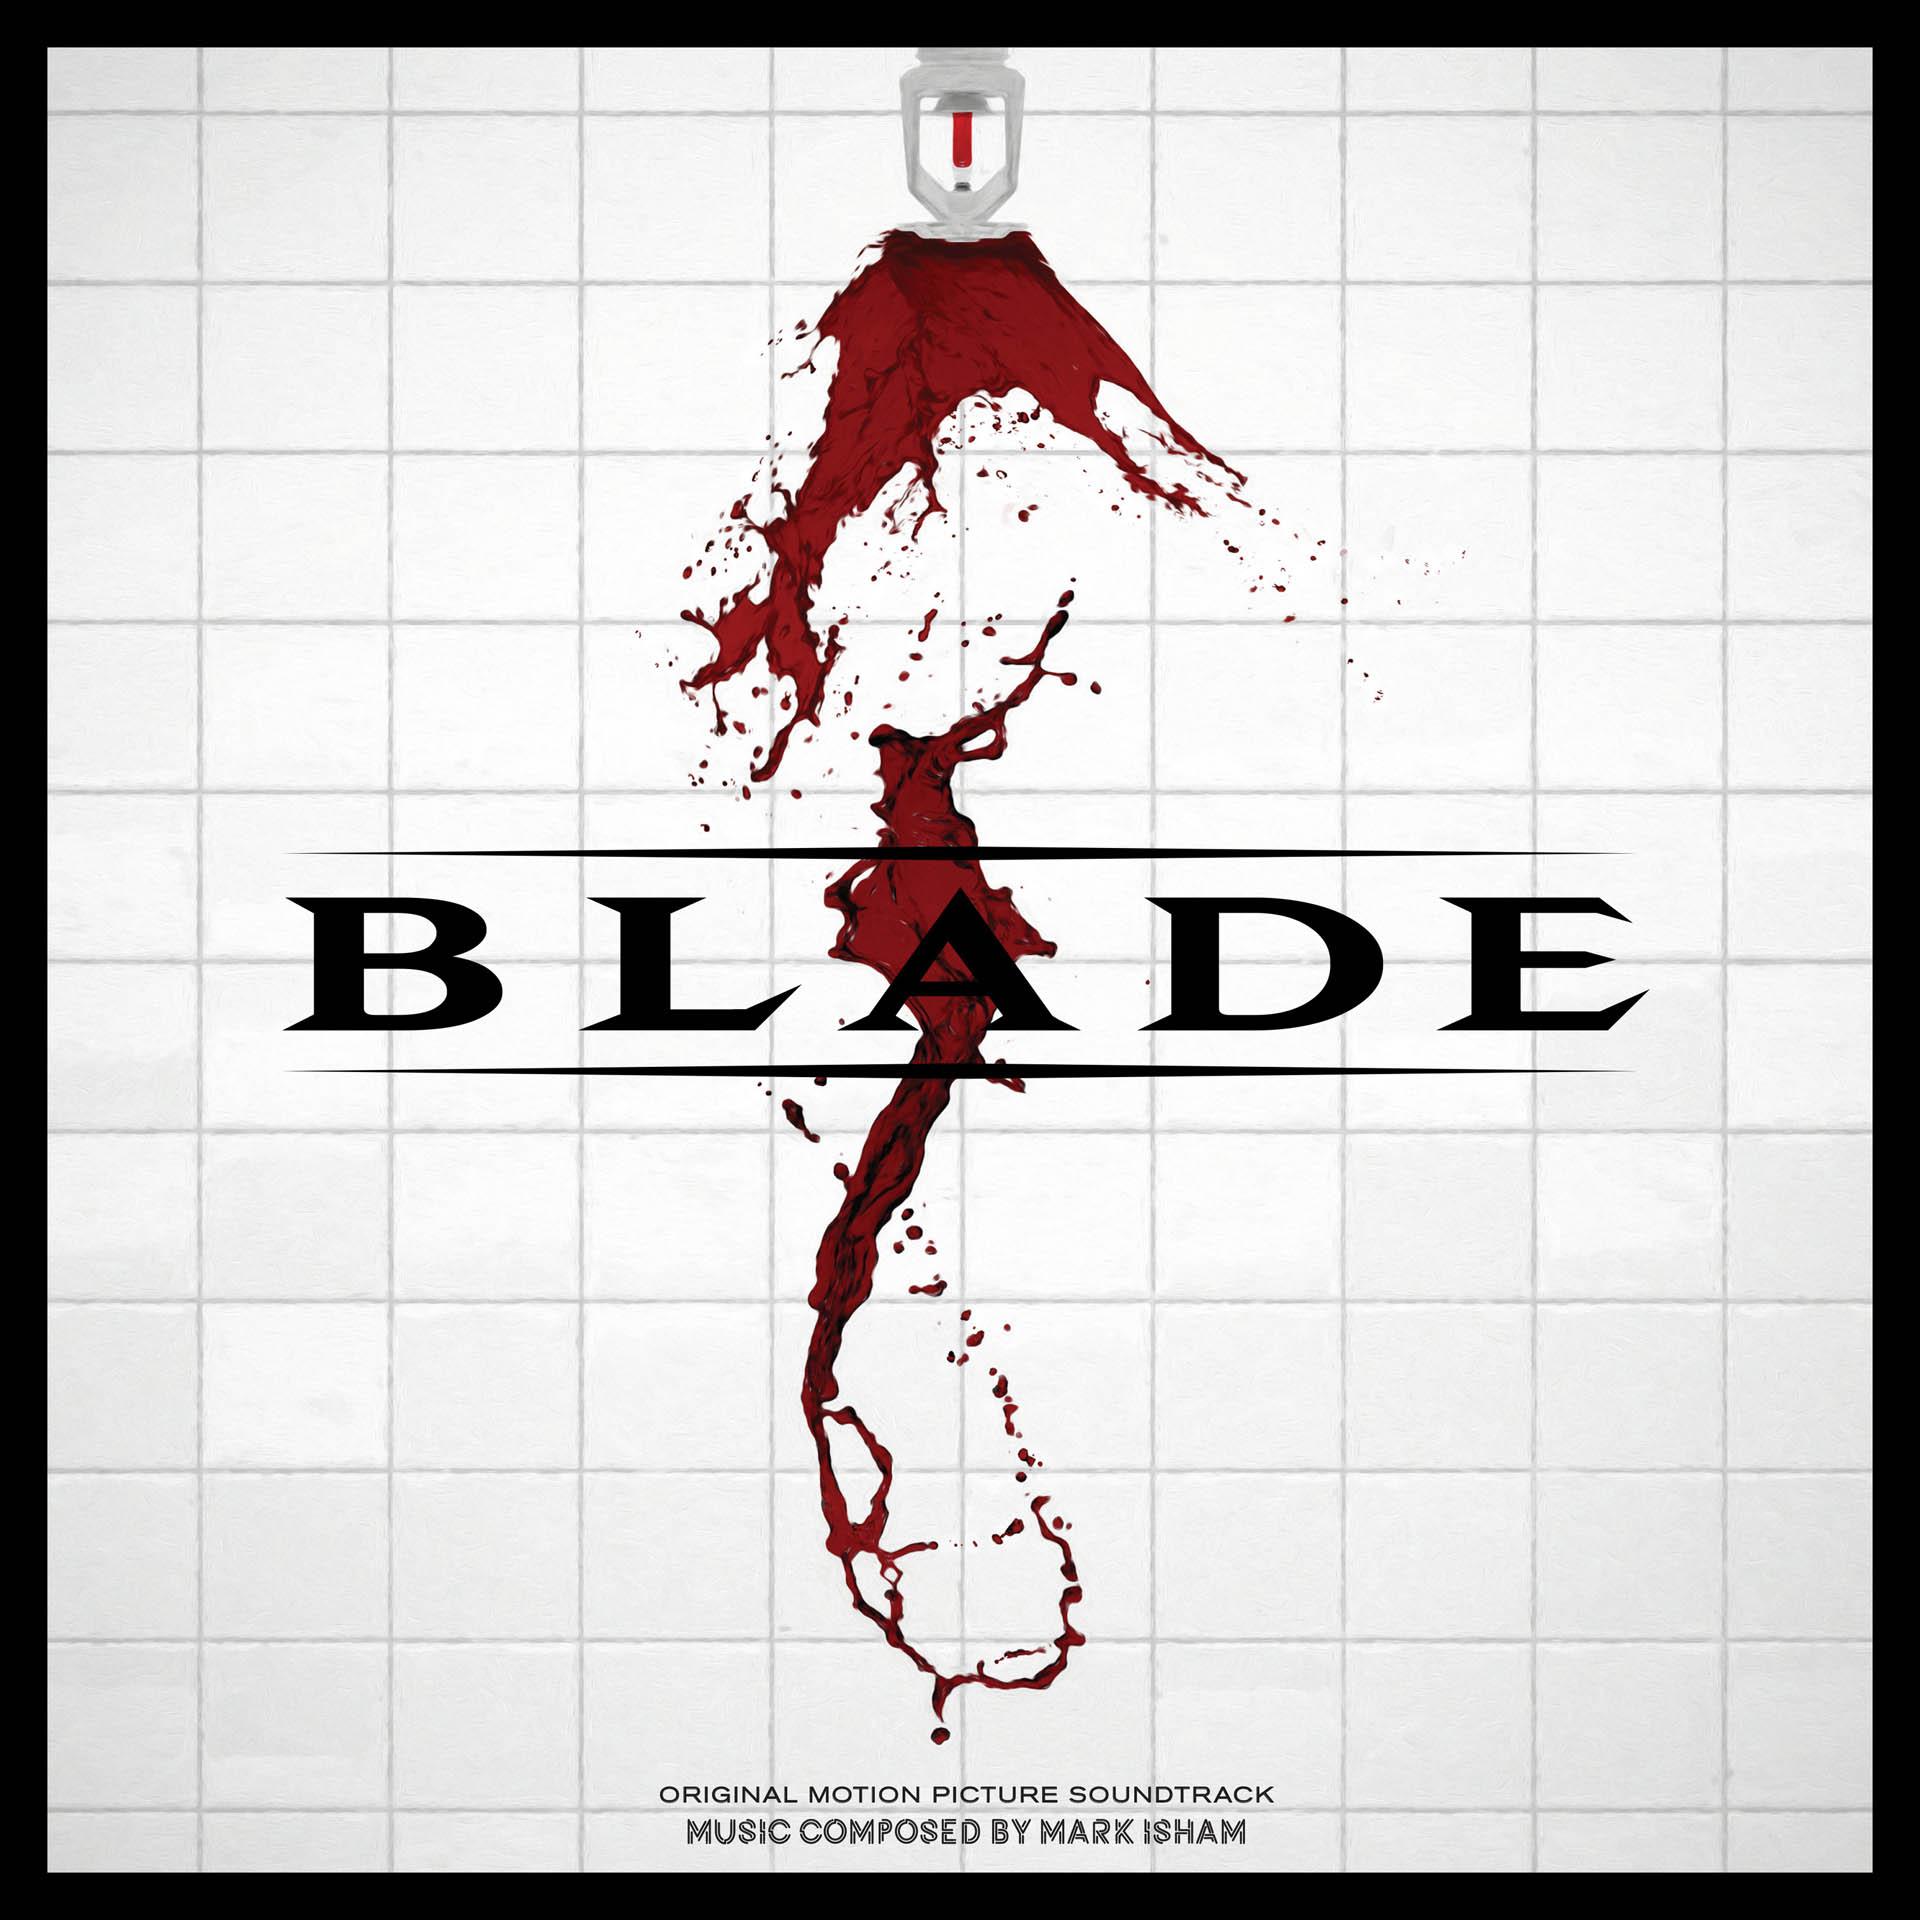 Blade Soundtrack